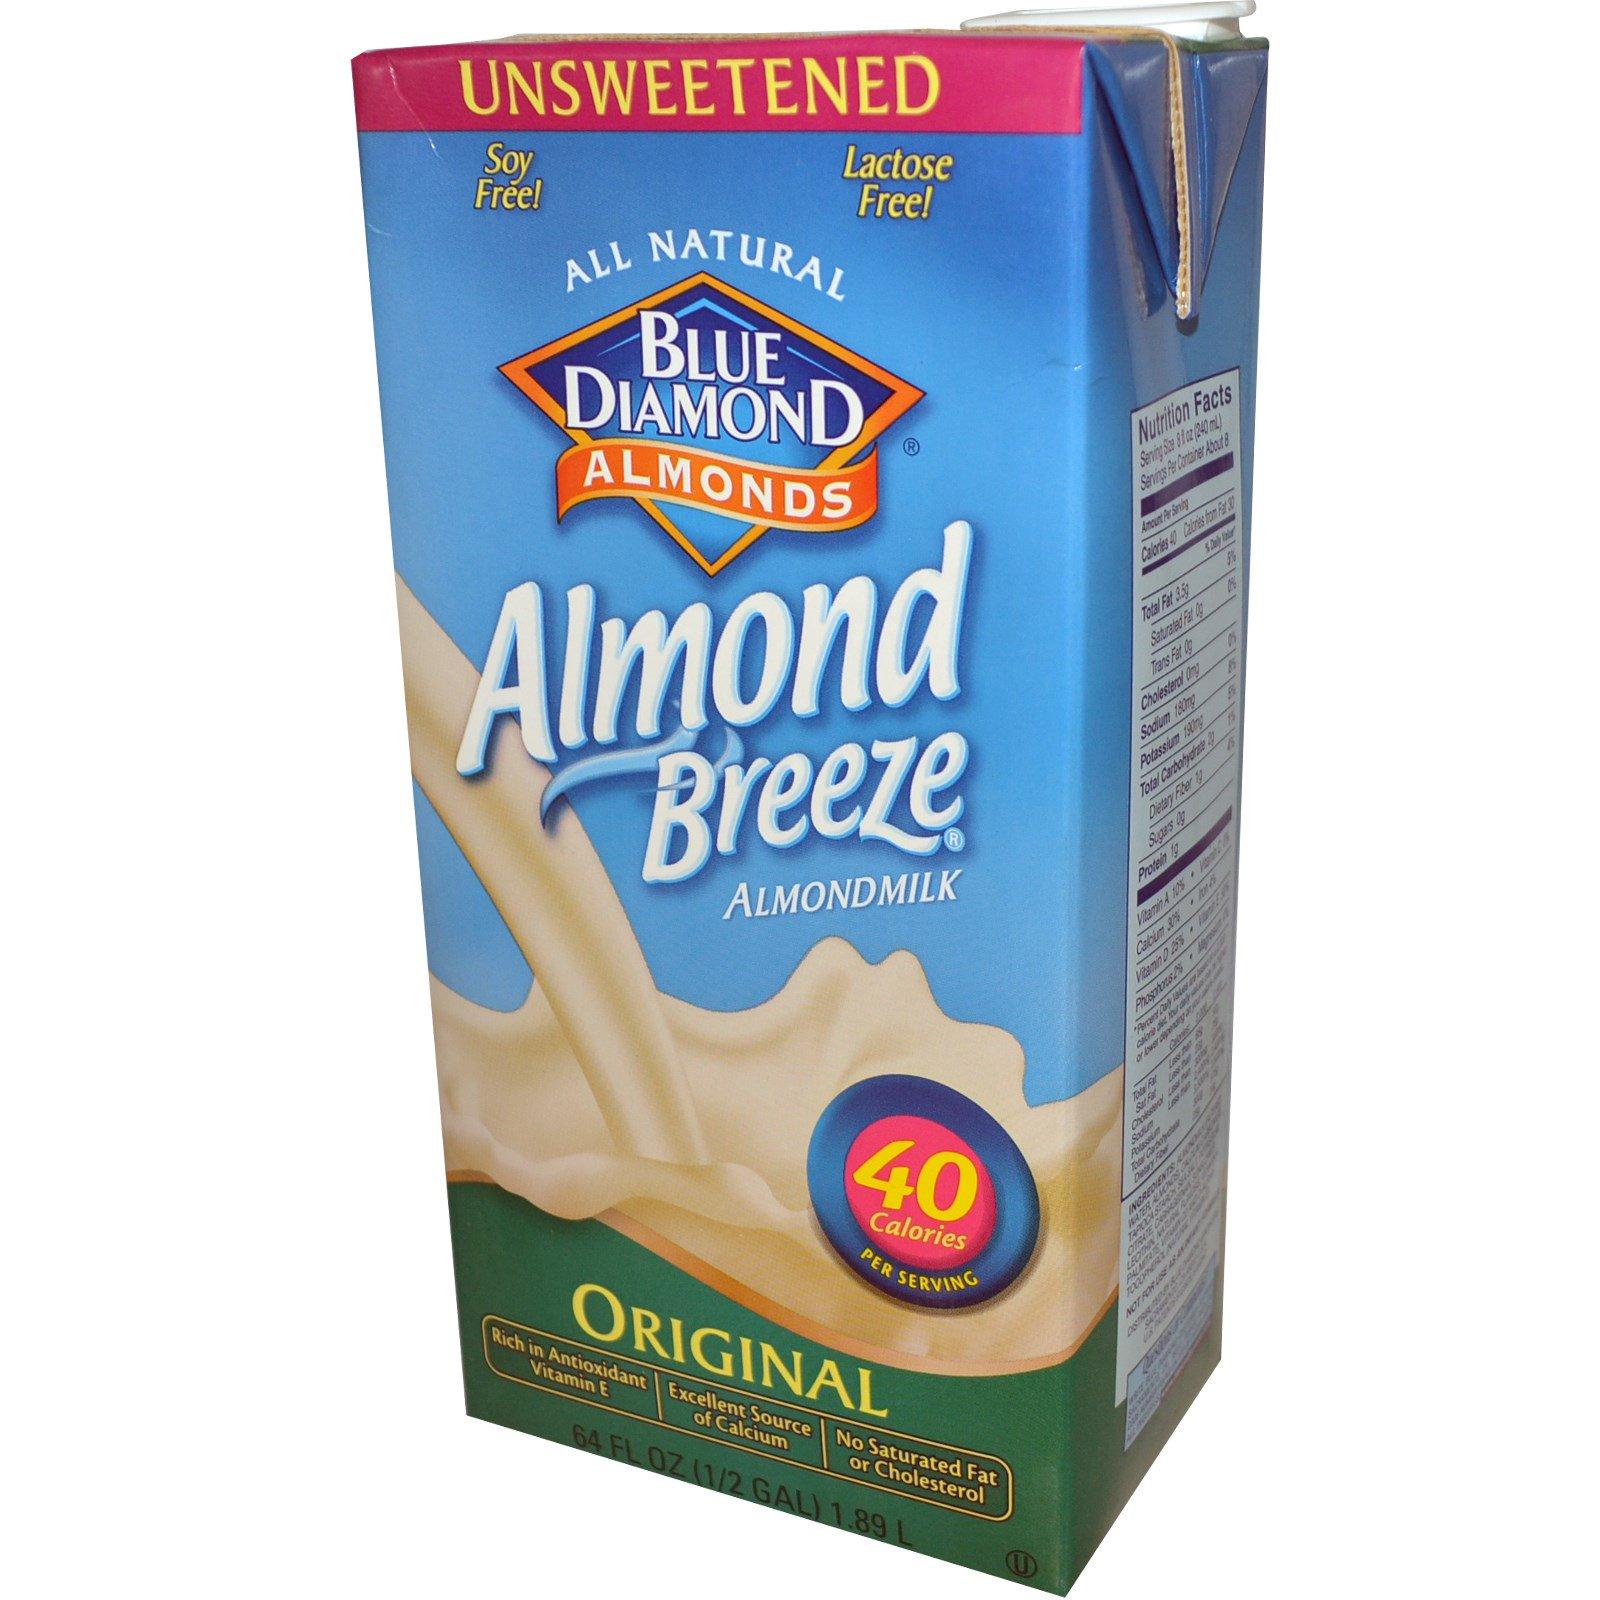 Blue Diamond, Almond Breeze, Almond